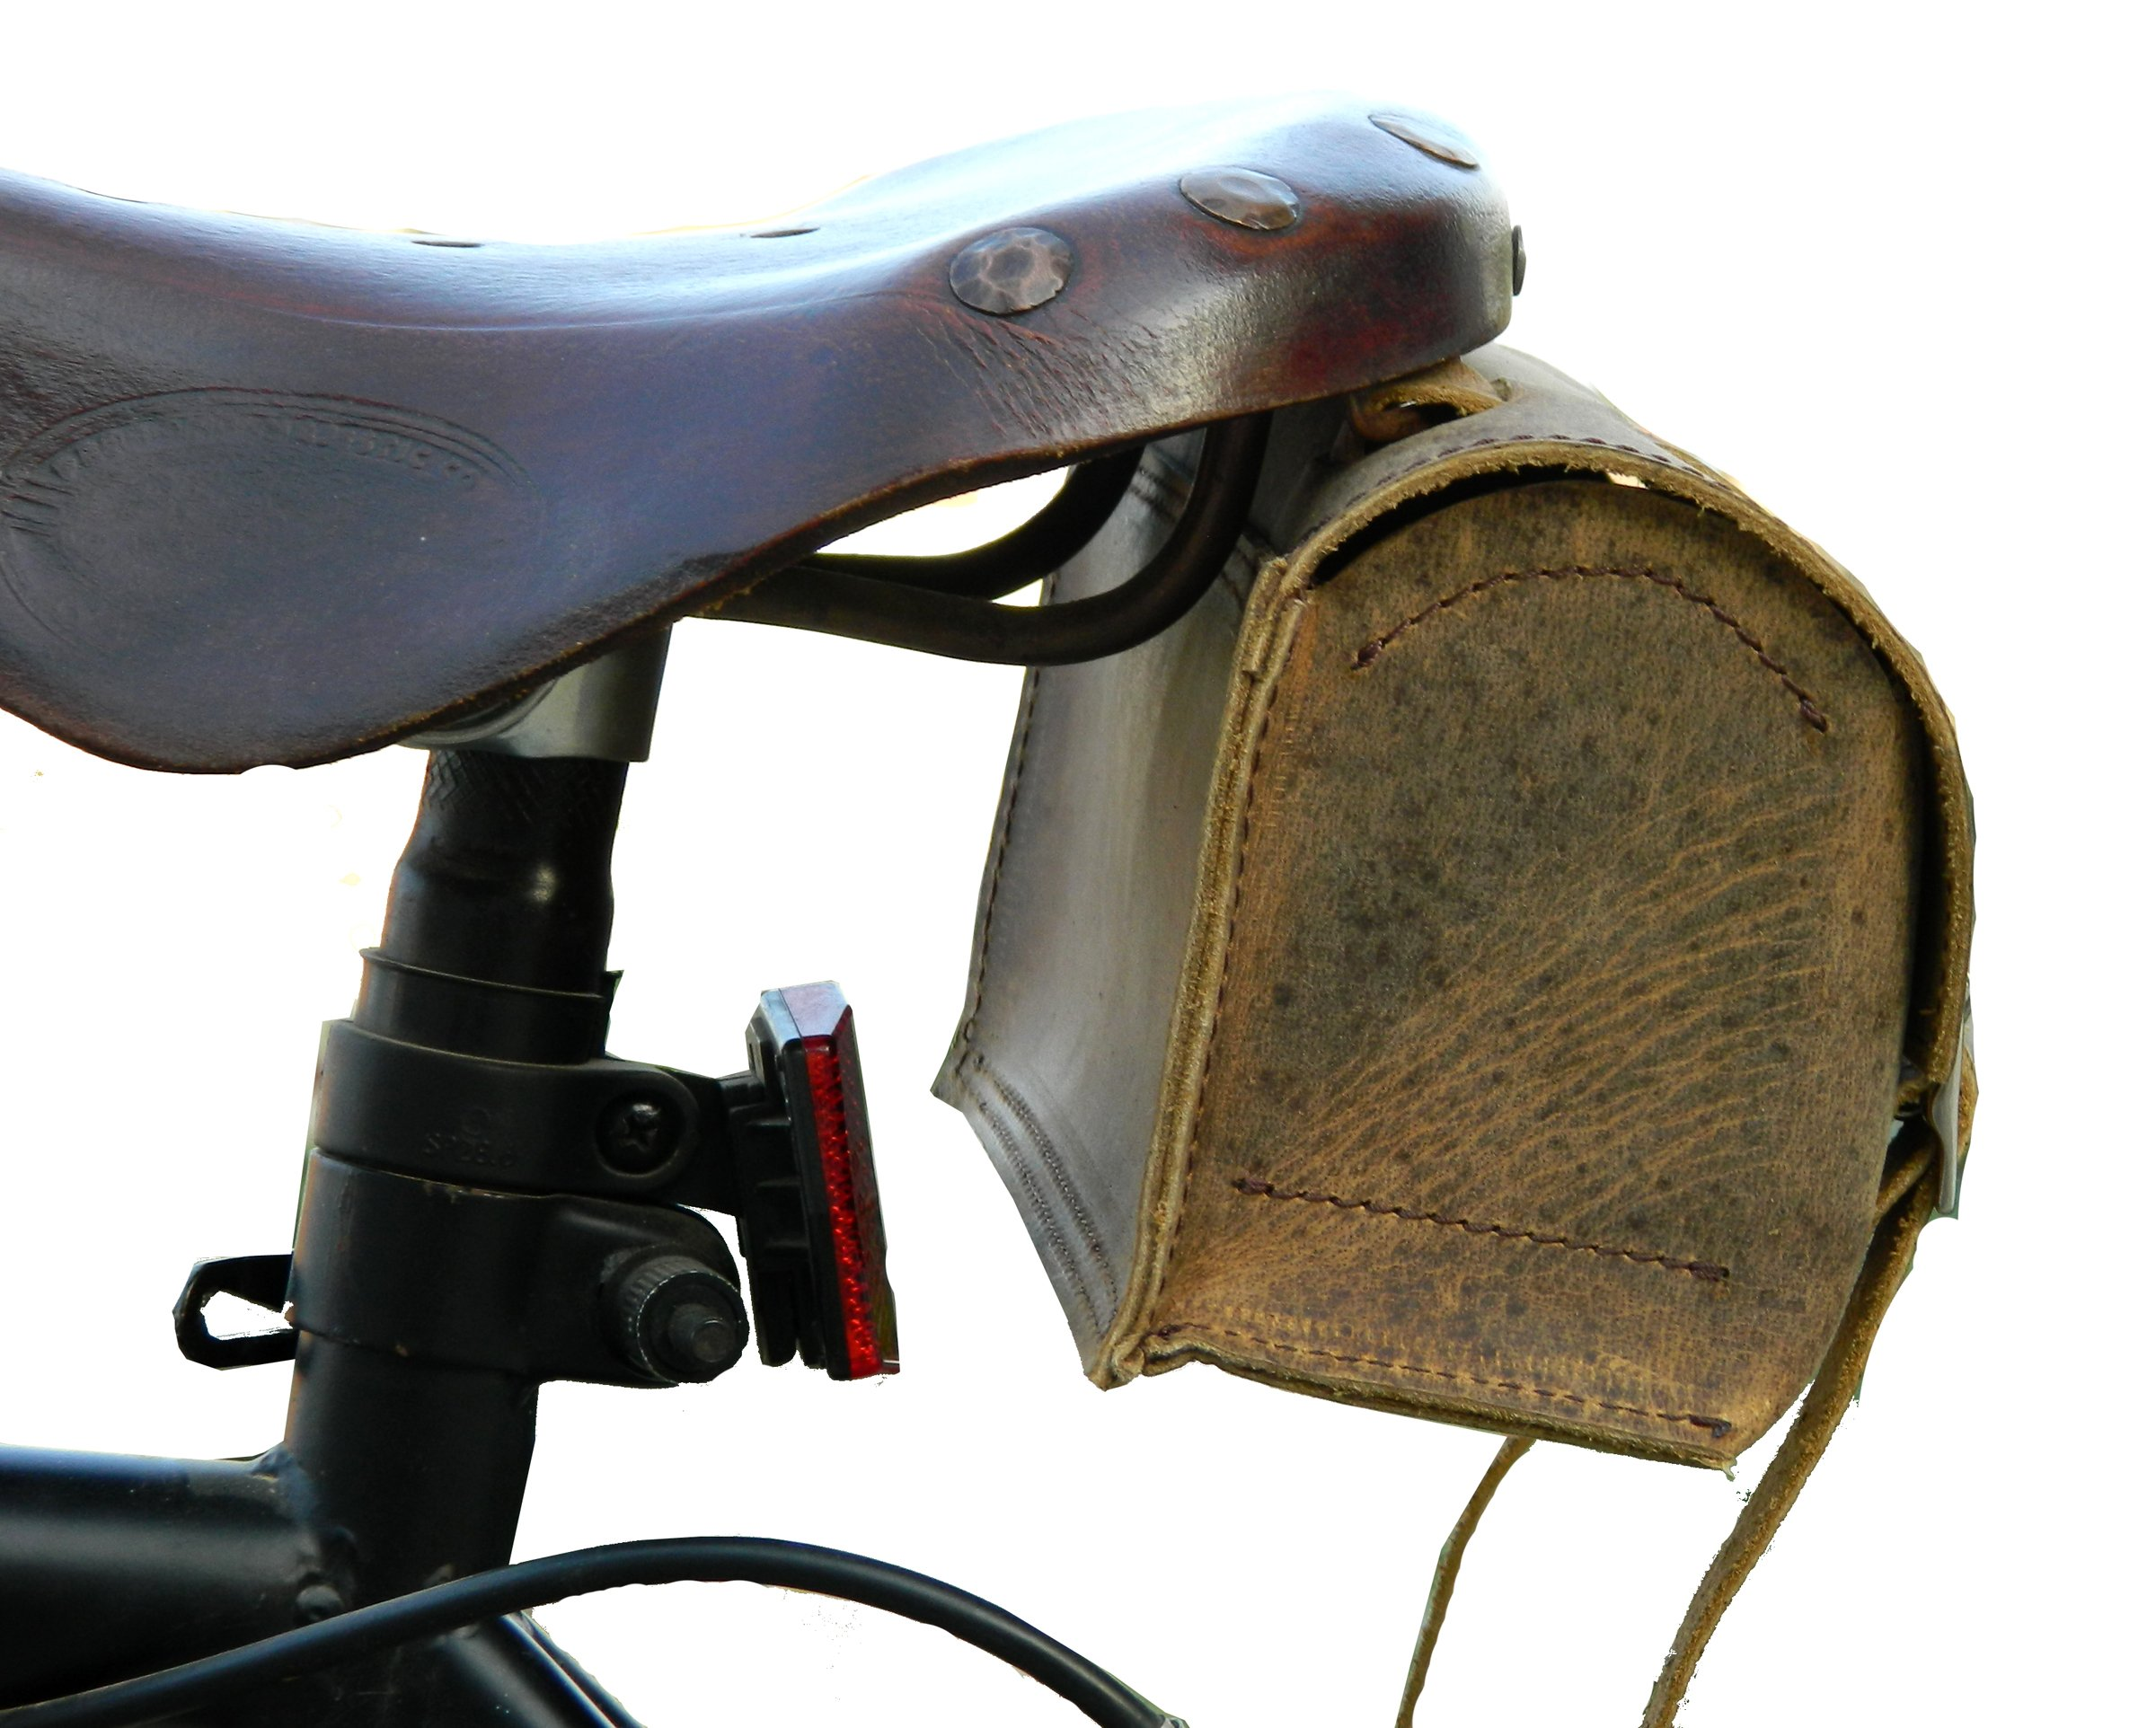 Herte Genuine Leather Bicycle Saddle Box Bag Utility Vintage Bag br by Herte (Image #3)